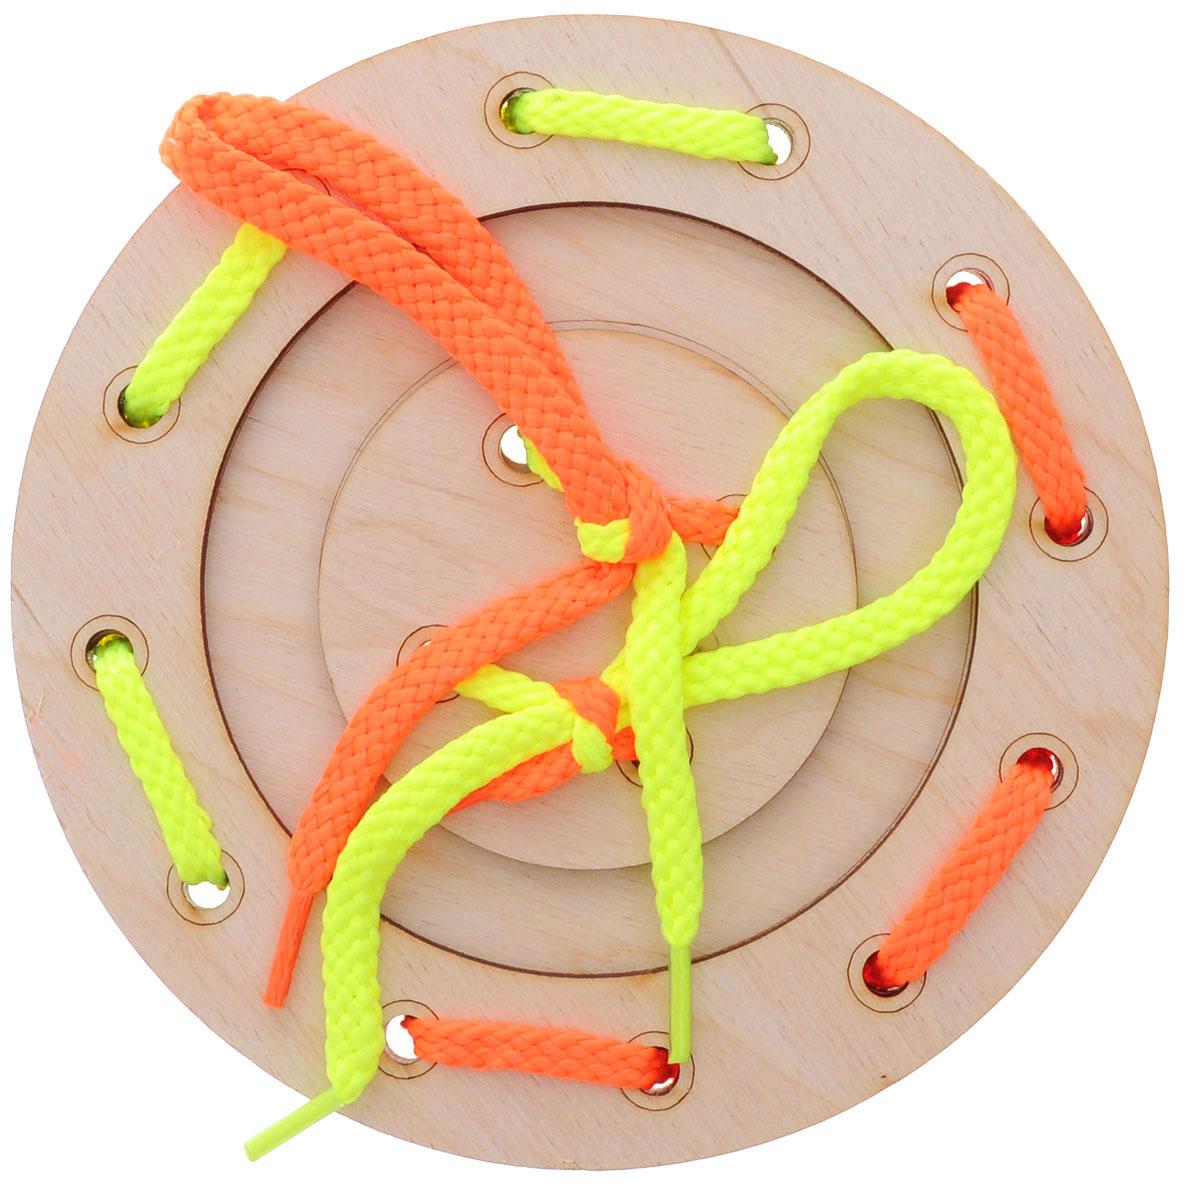 Мастер Вуд Игра-шнуровка Пуговичка цвет желтый оранжевый мастер вуд игра шнуровка пуговичка цвет синий желтый